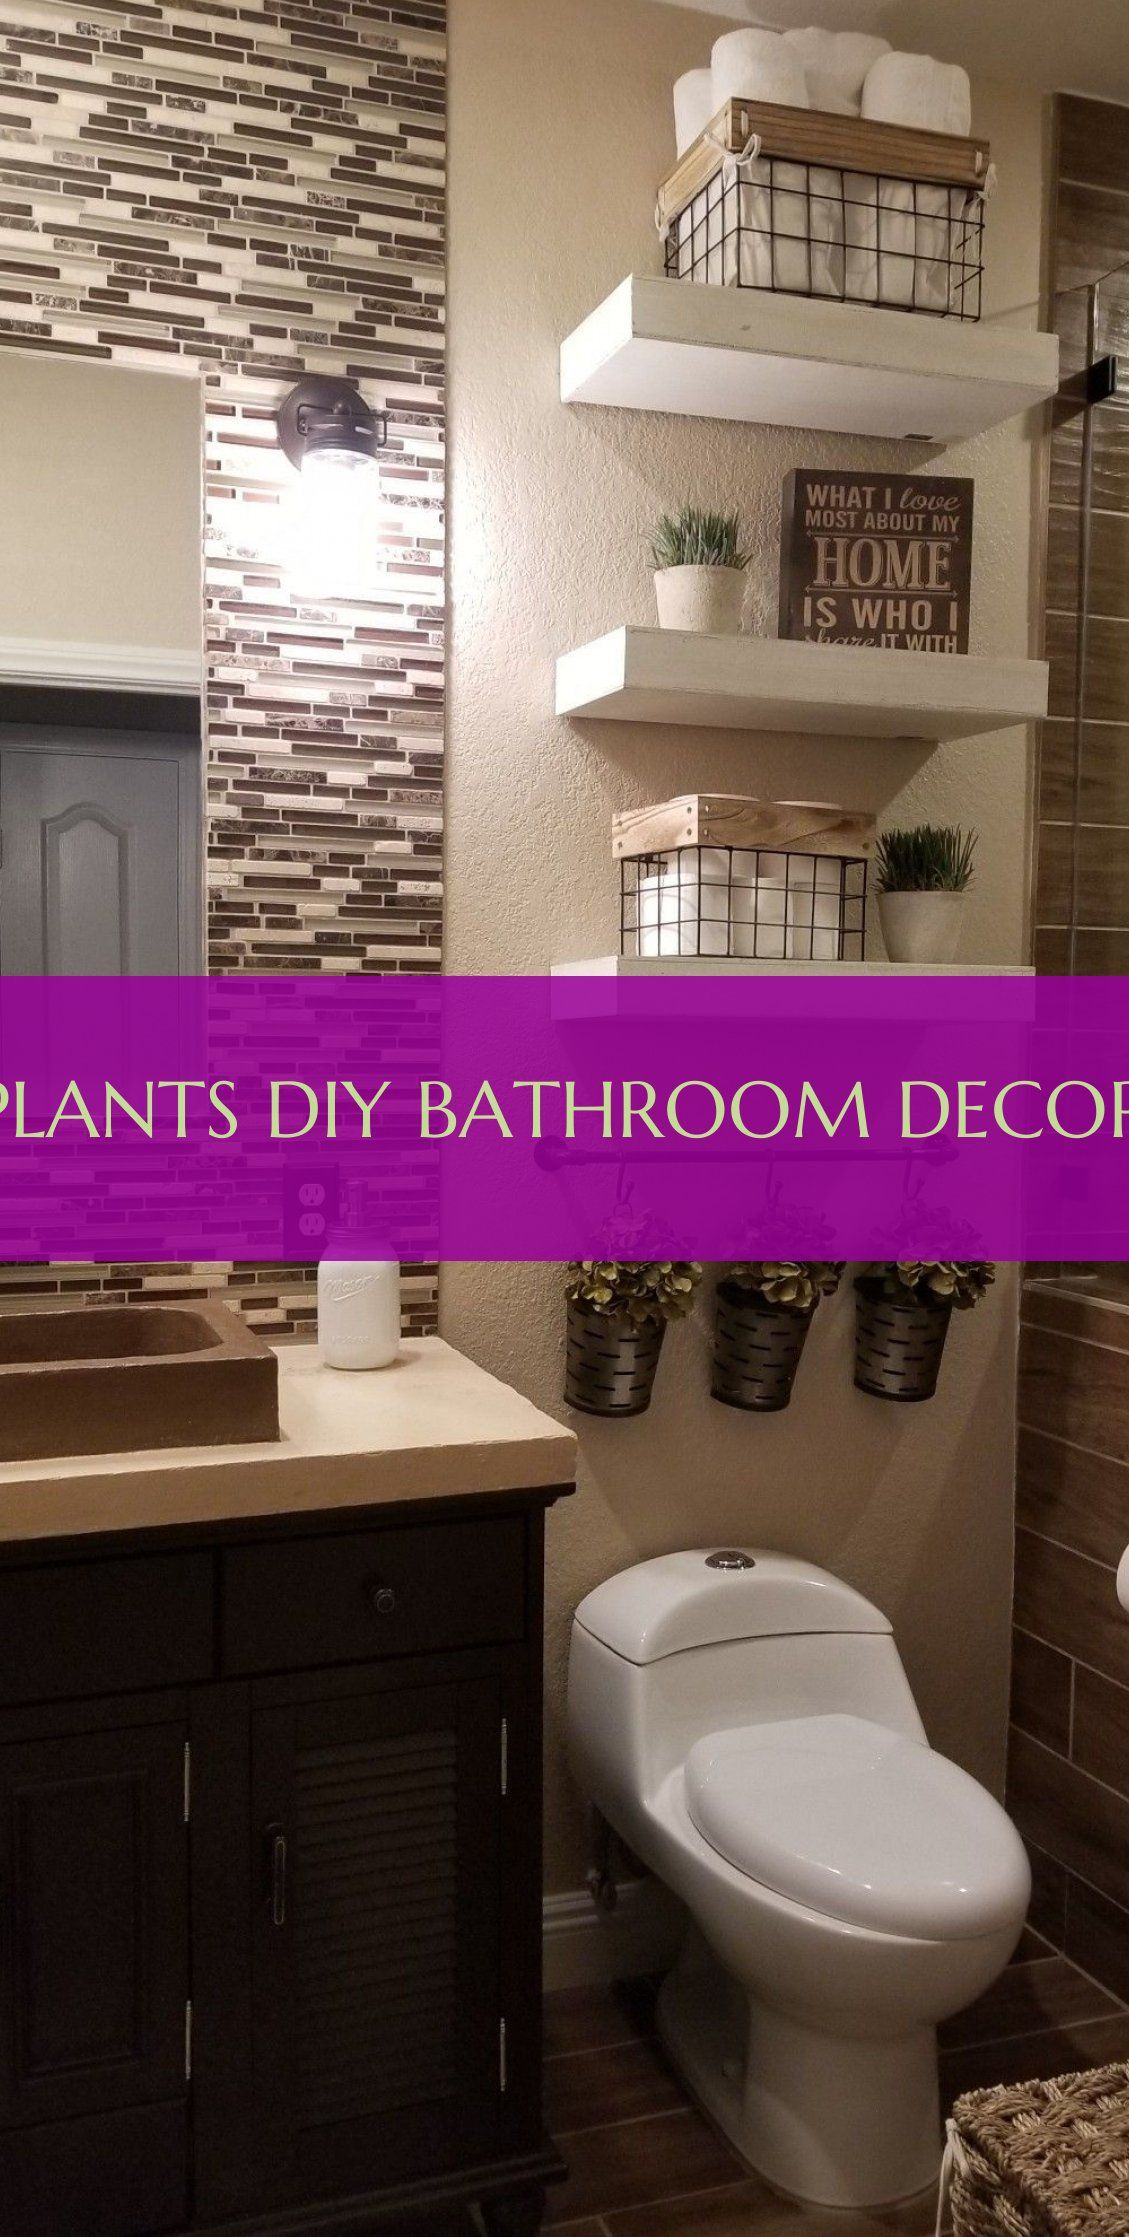 Plants diy bathroom decor